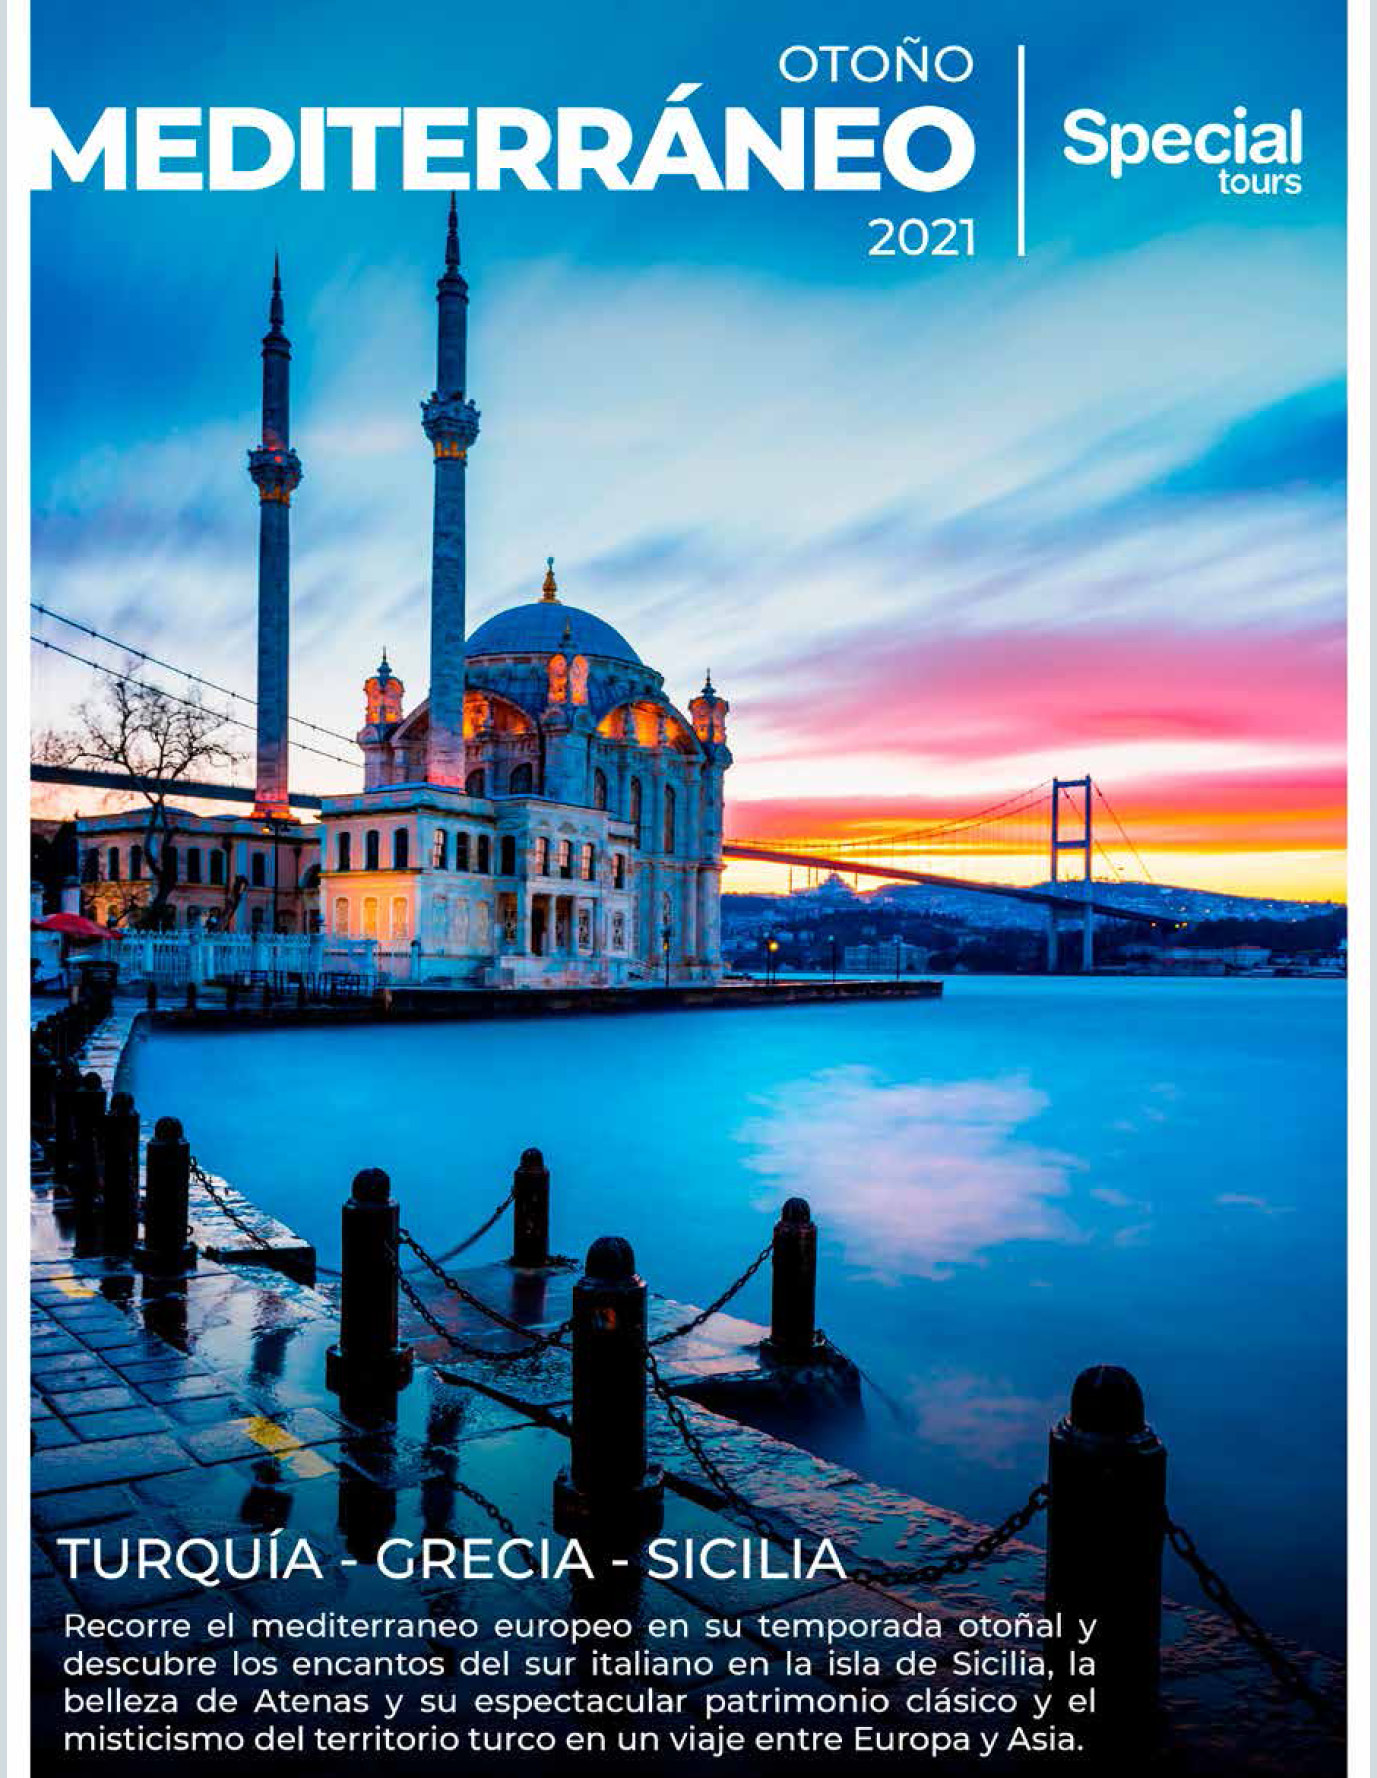 Catalogo Special Tours Mediterraneo Otono 2021